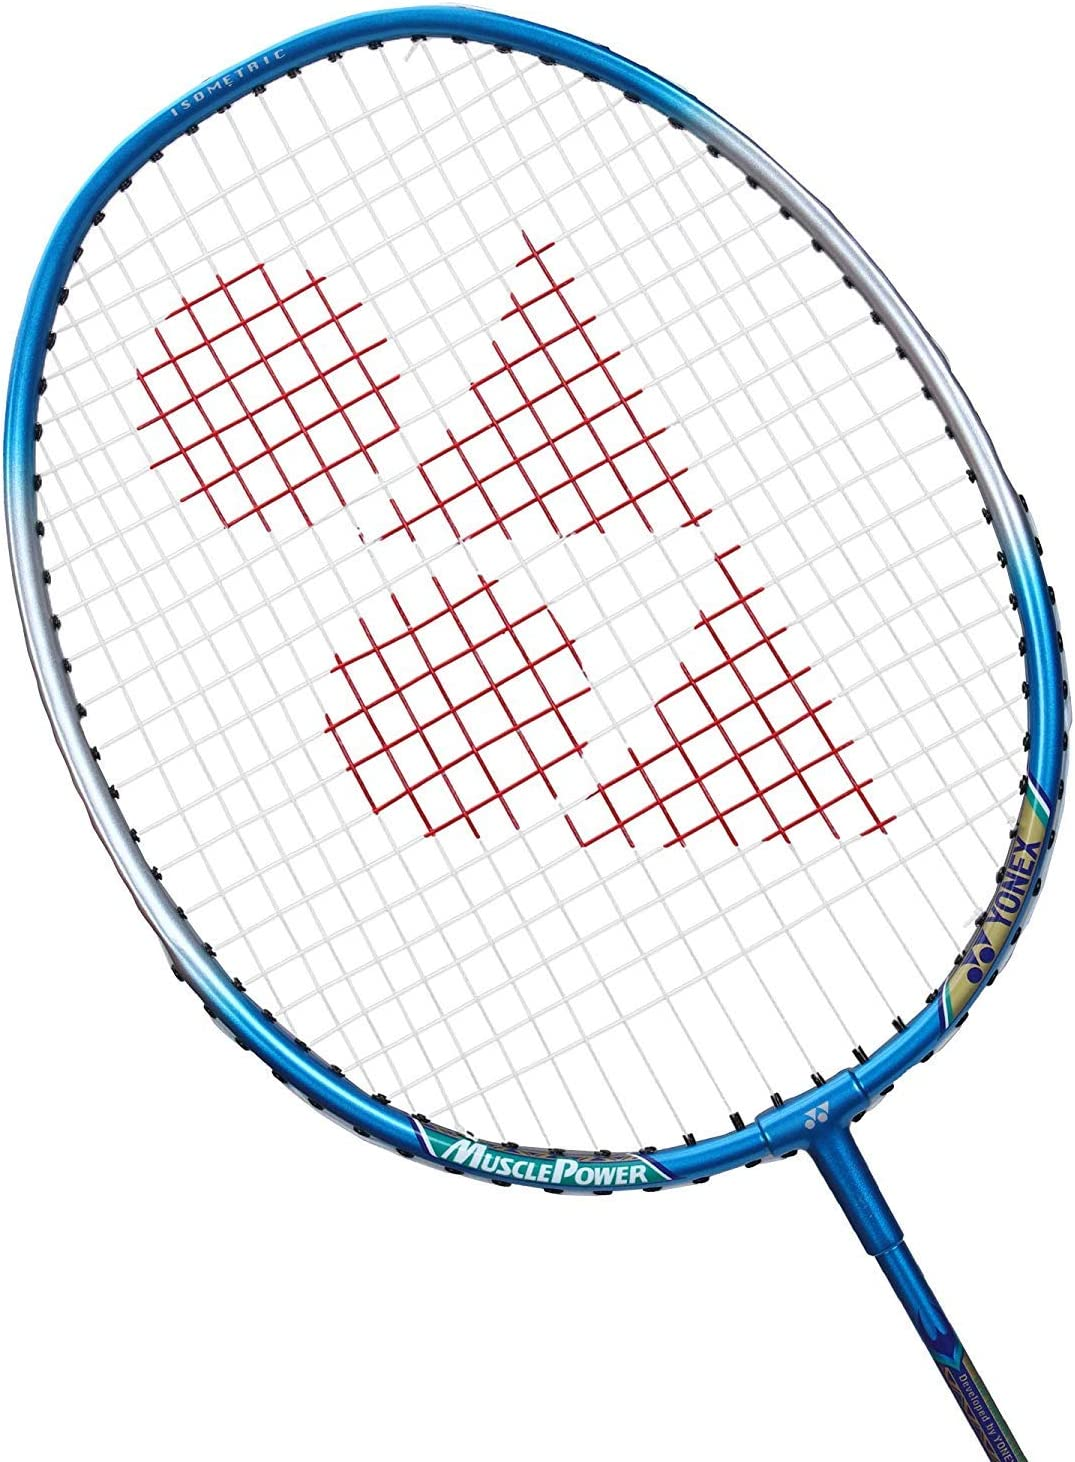 2 Racket Family Set YONEX Muscle Power 2 Badminton Racket Multiple Options